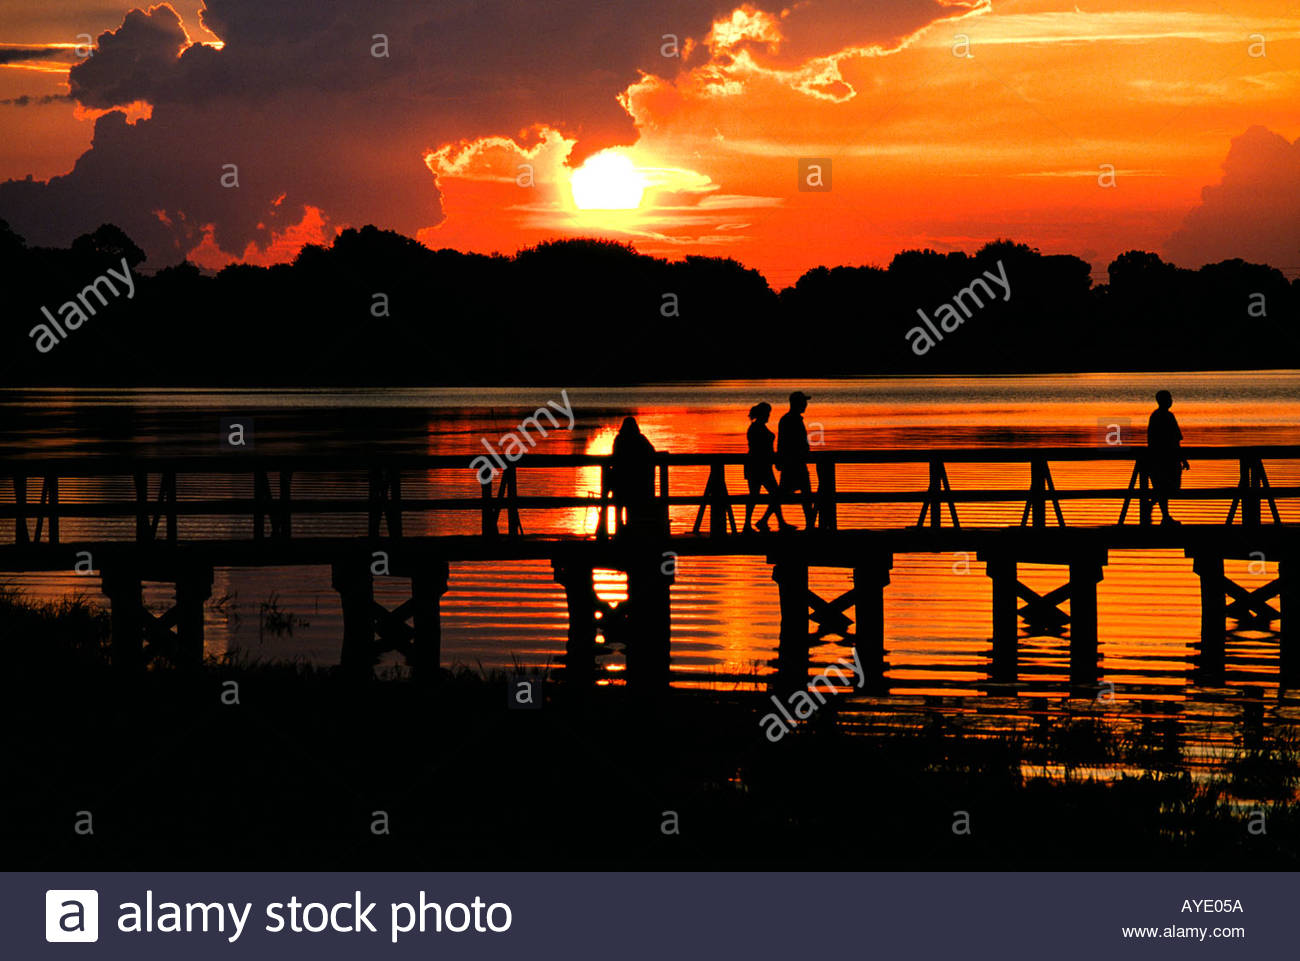 Golden orange sunset over Lake Mineola at the pier in Clermon Florida USA - Stock Image